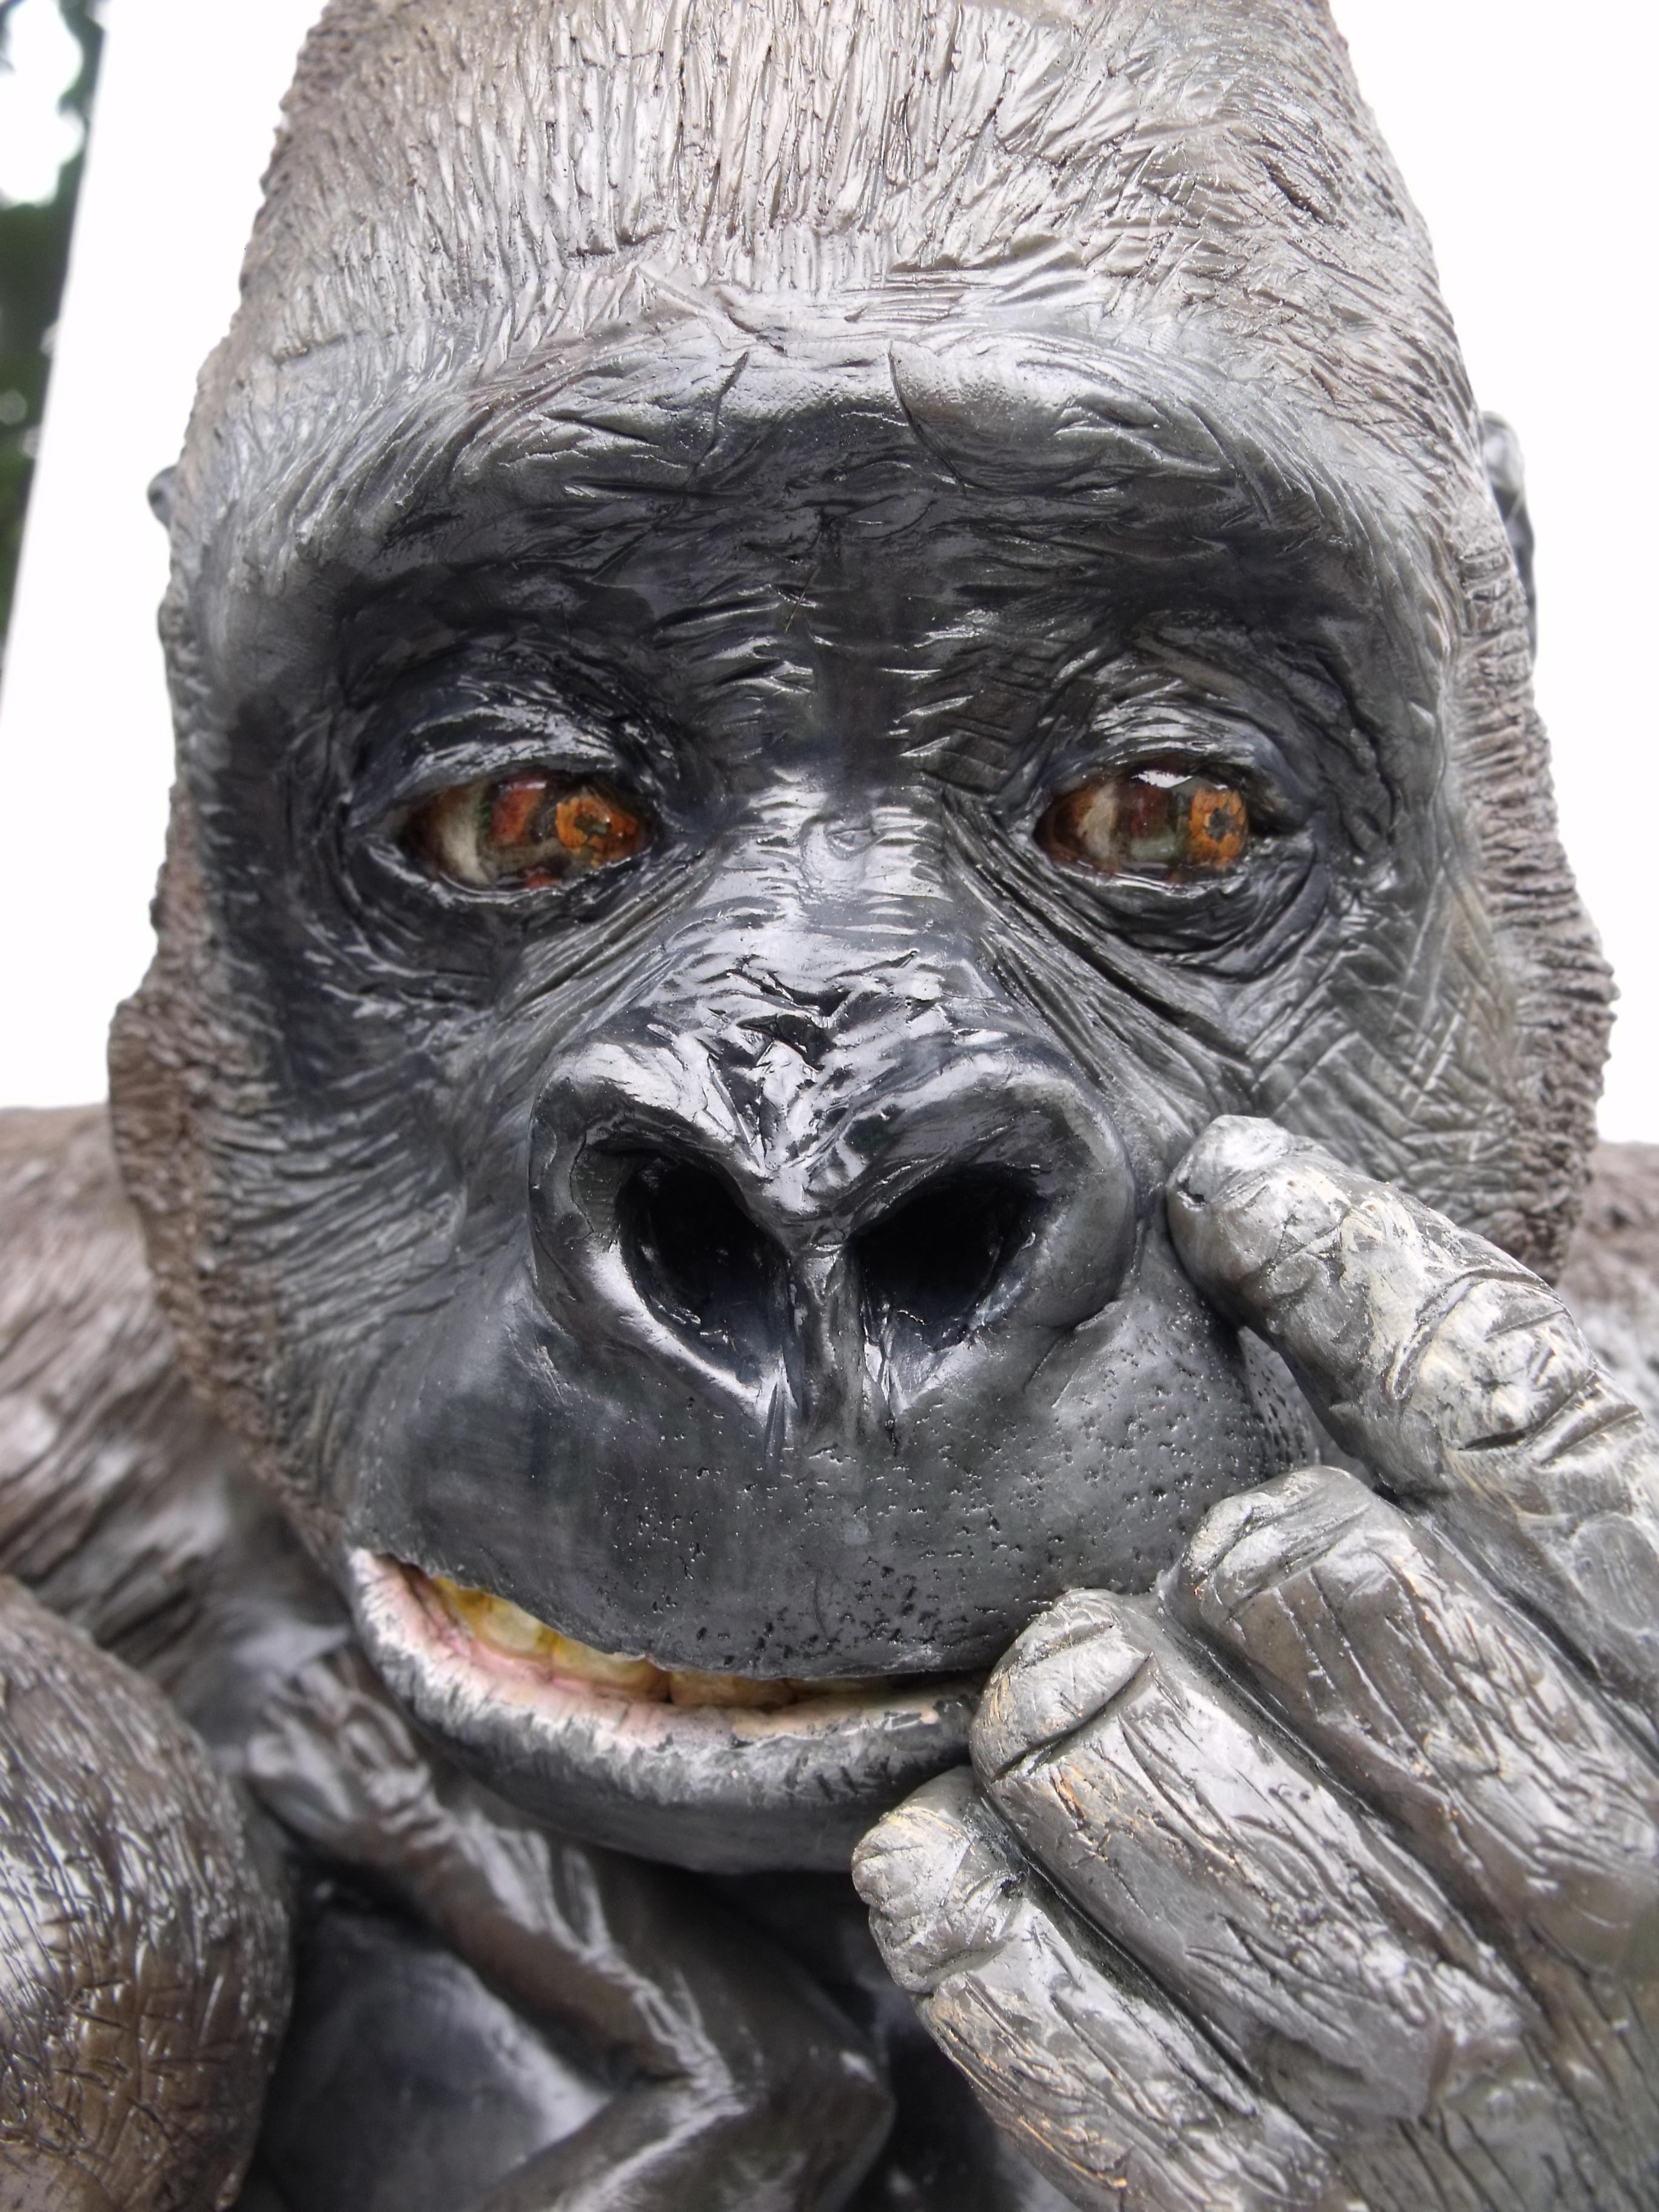 White chocolate Western Lowland Gorilla